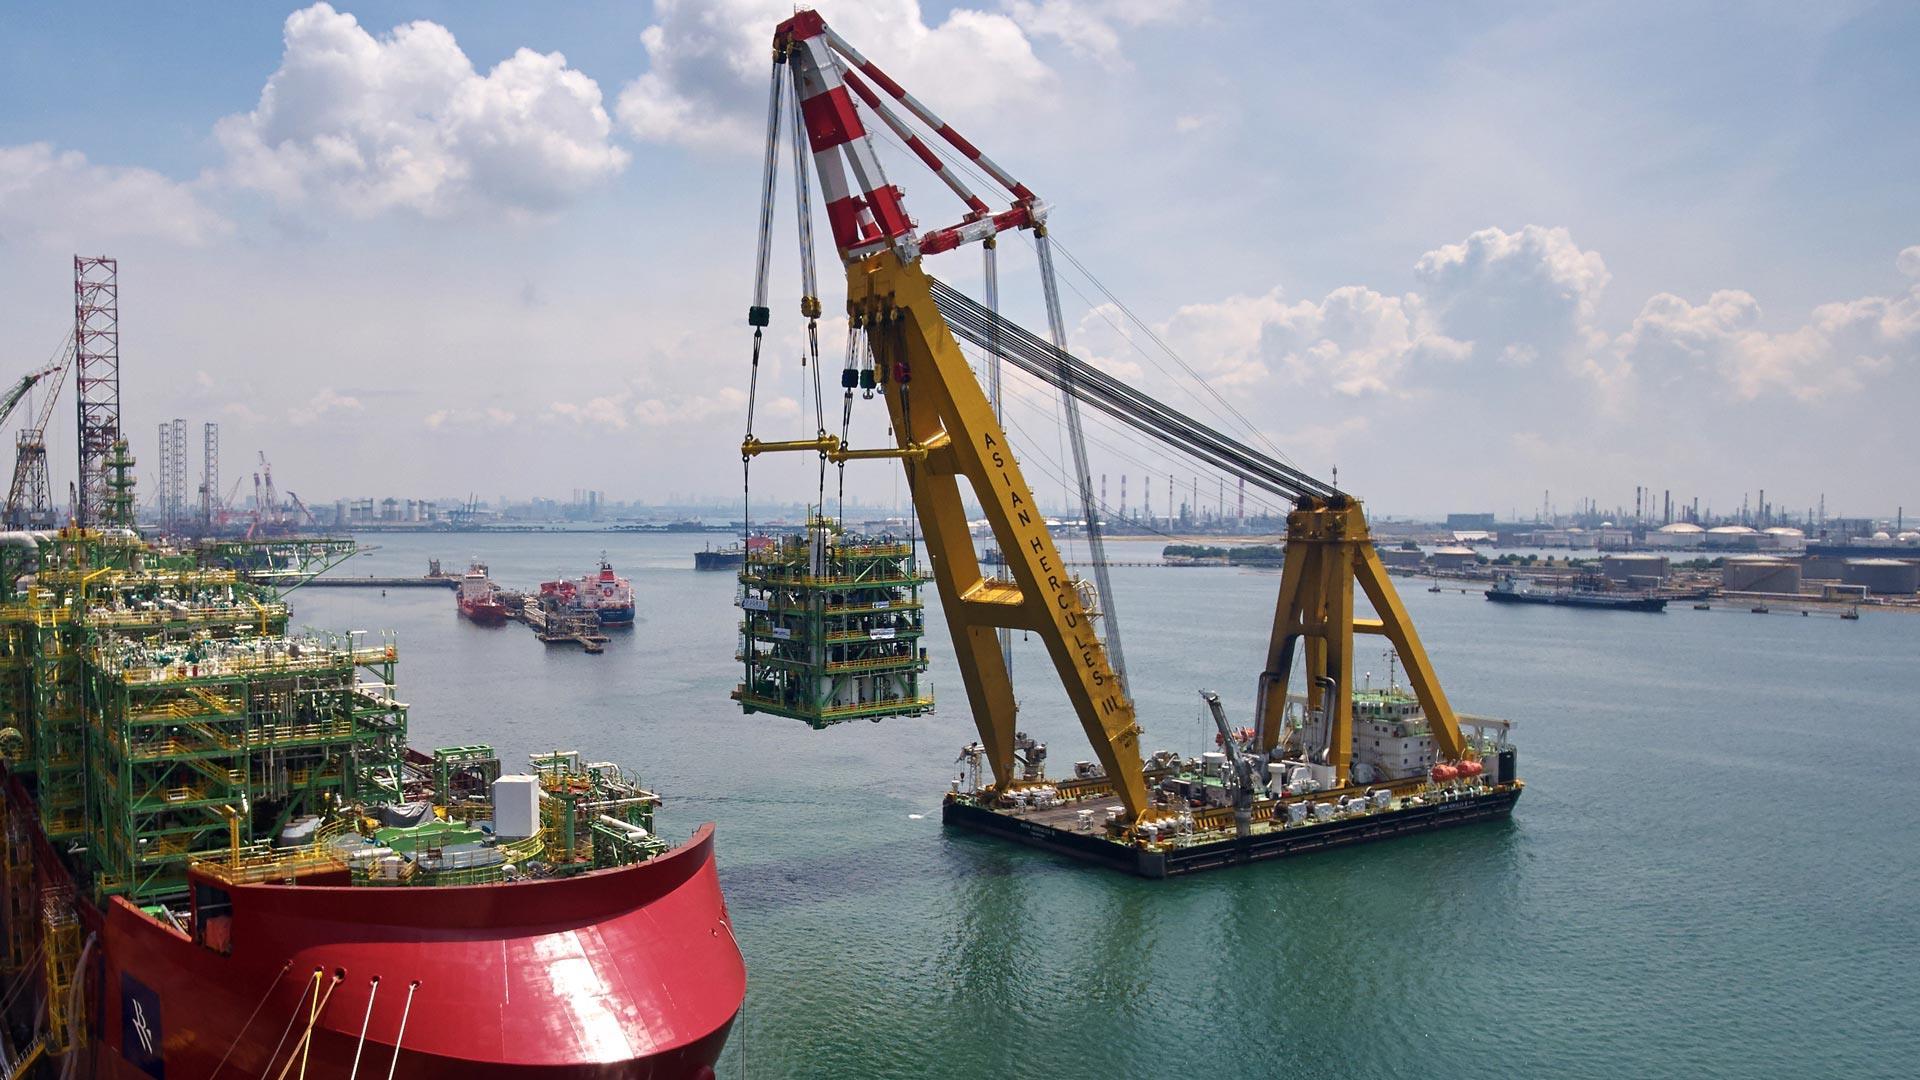 Seawater Treatment crane loading module